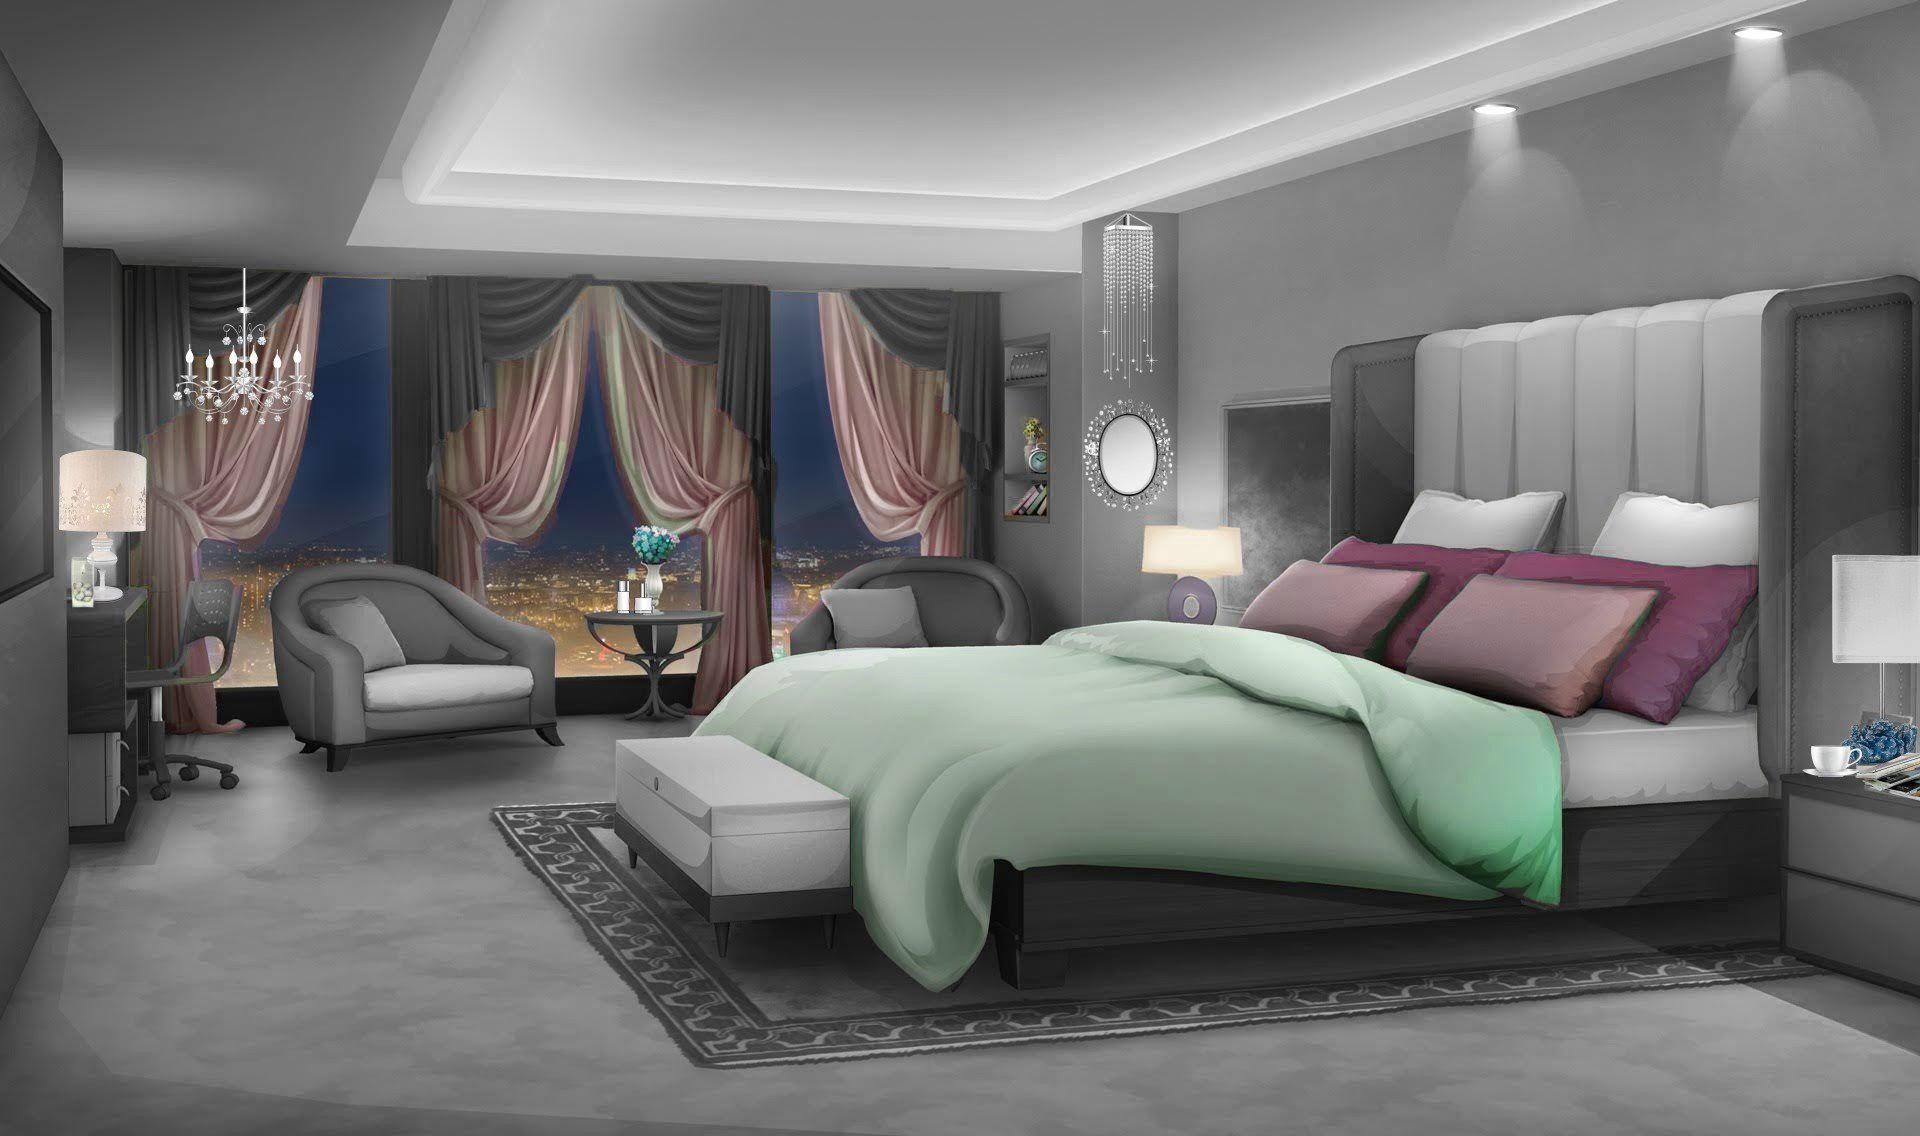 17++ Anime bedroom background ideas